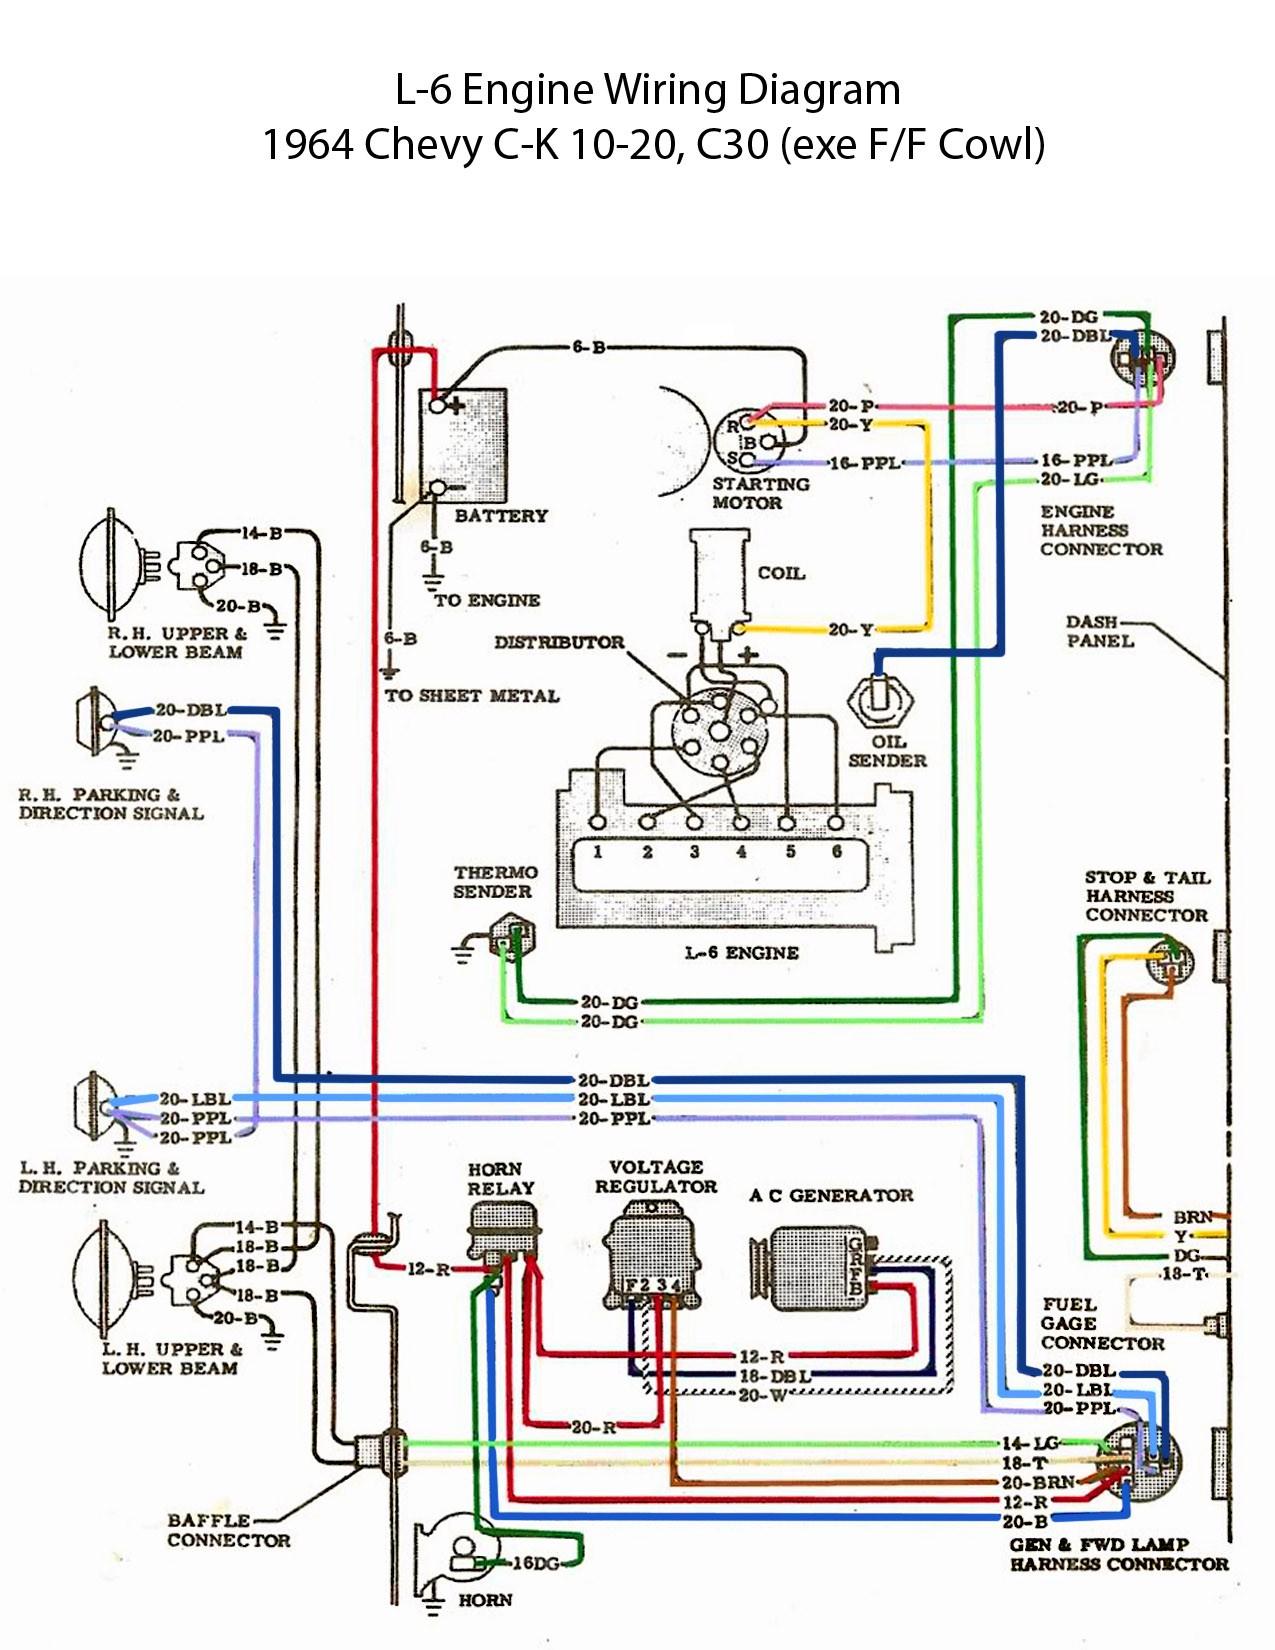 1974 Chevy Truck Wiring Diagram 1949 Chevy Truck Wiring Diagram Free Image Wiring  Diagram Engine Of